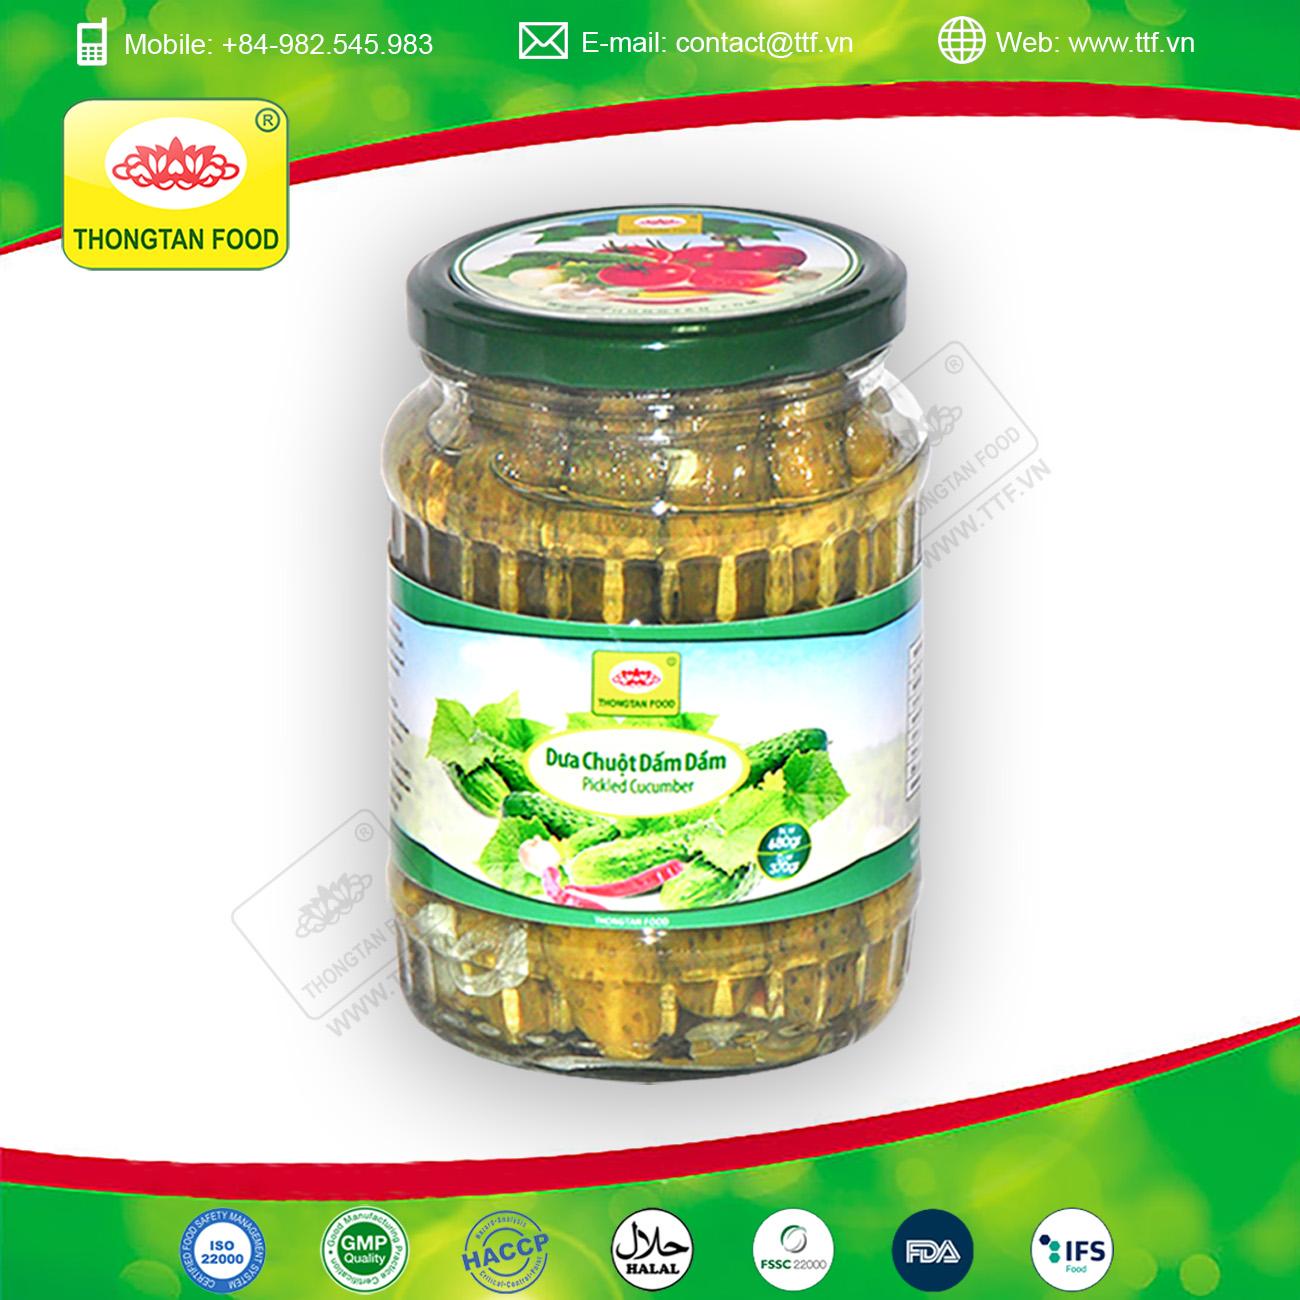 High quality pickled cucumbers in glass jar